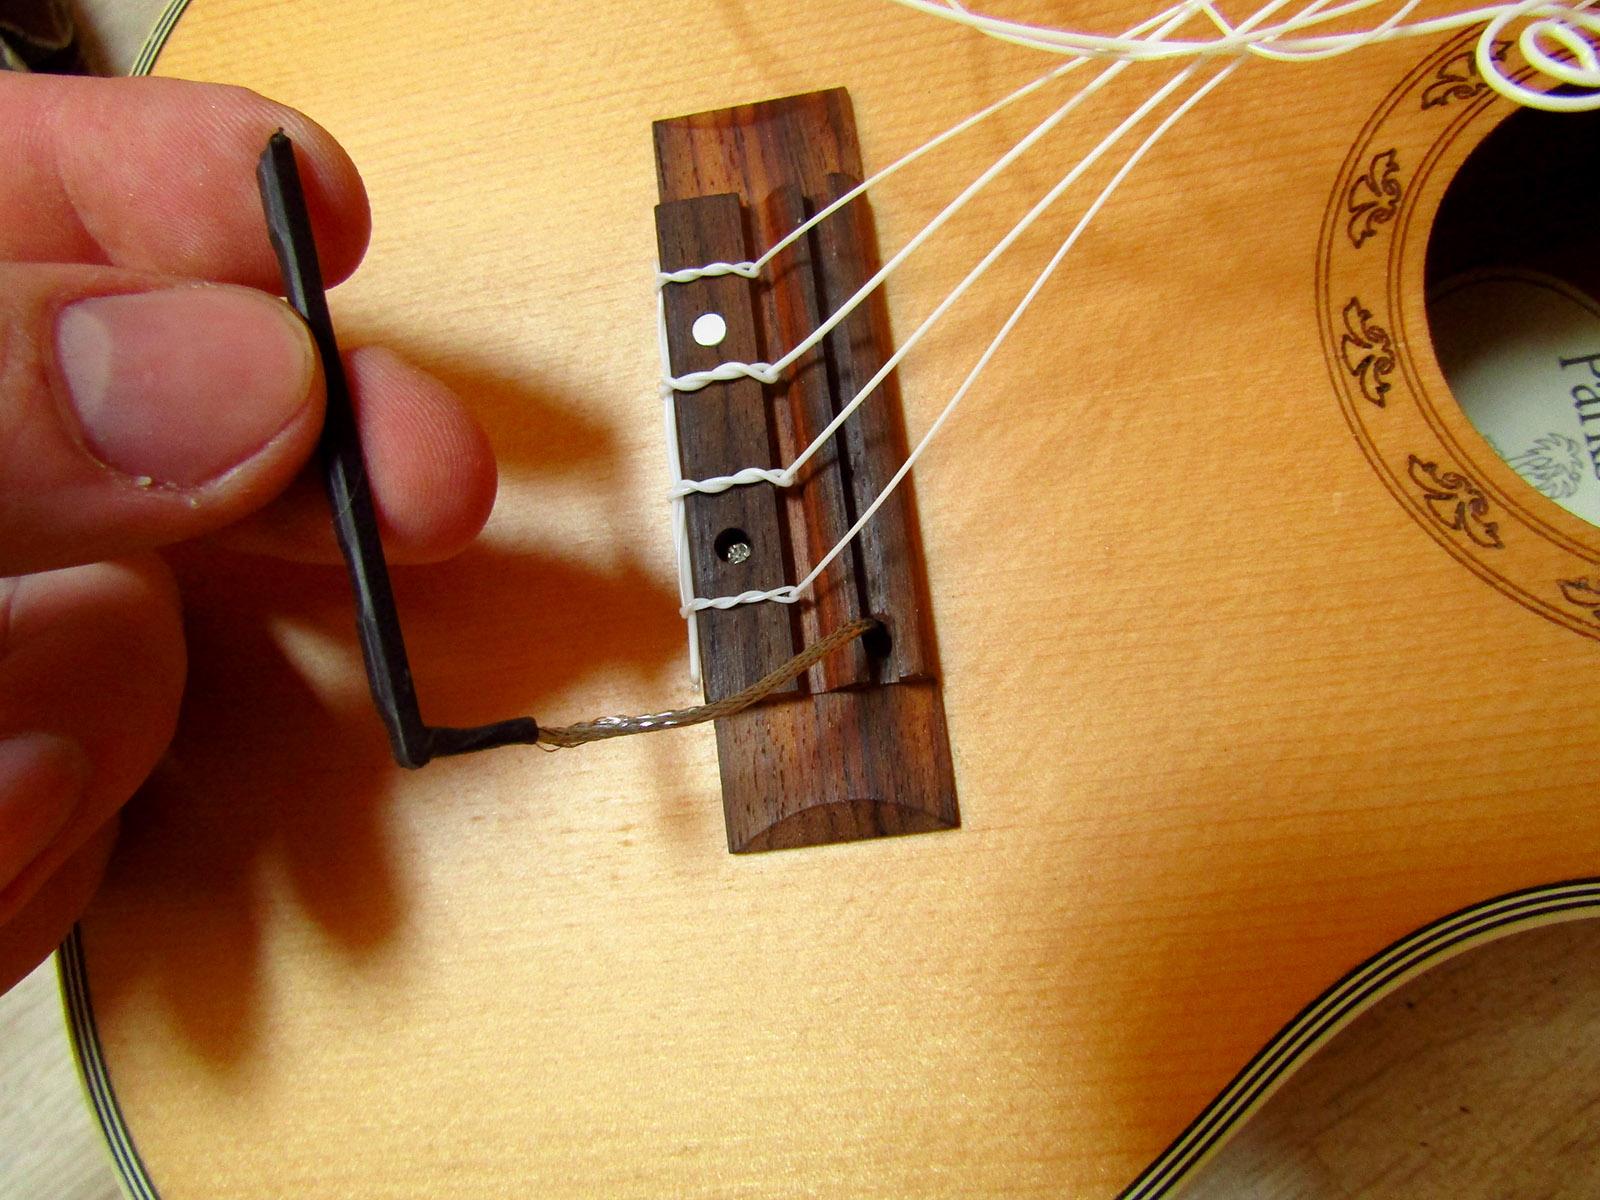 Як поставити звукознімач на укулеле